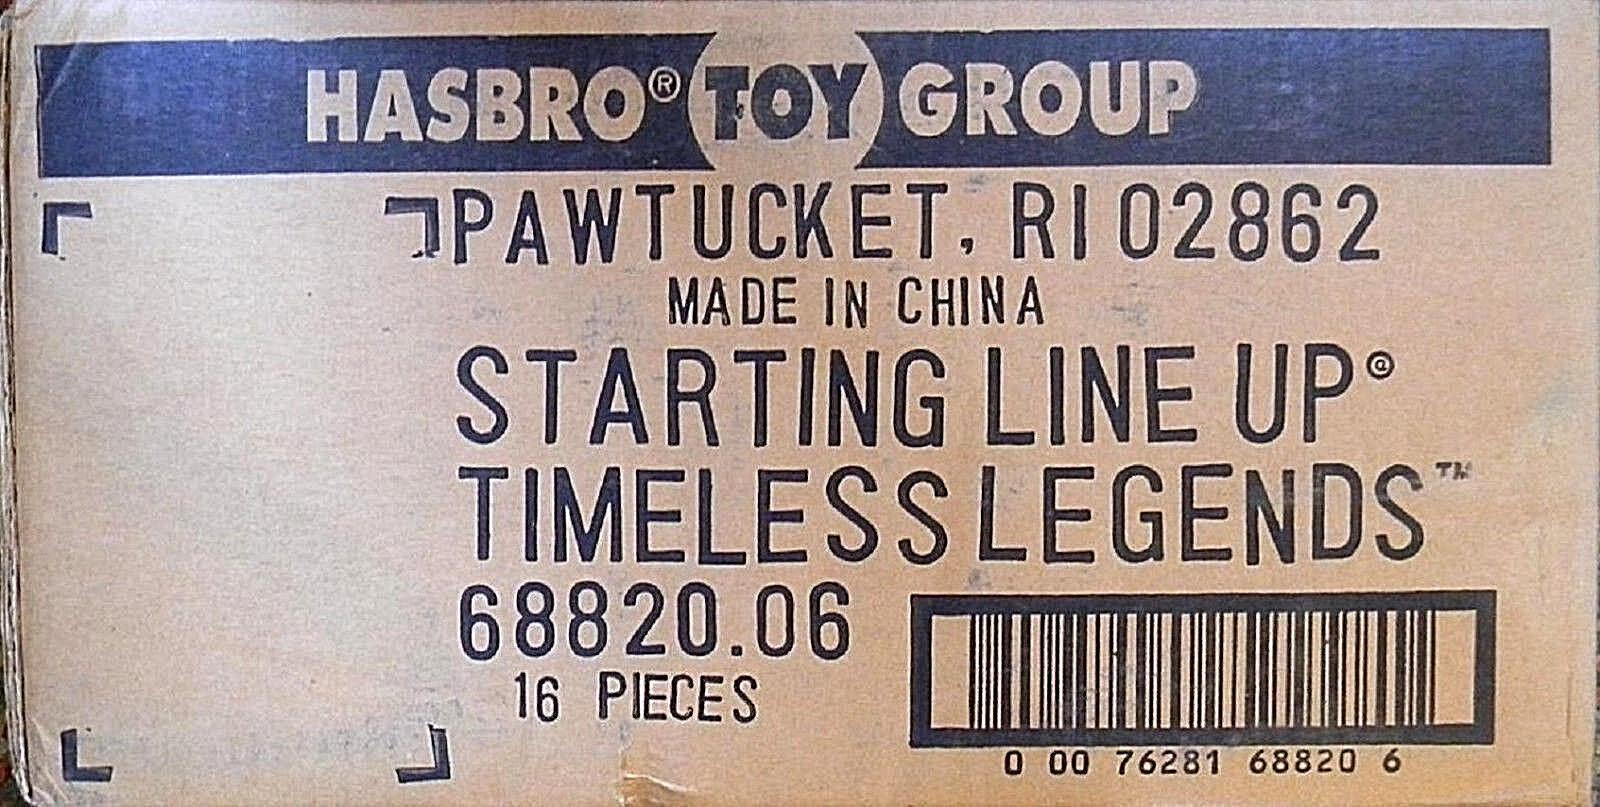 SLU 1996 Tmeless Legends Sealed 16 Figure Case 68820.06